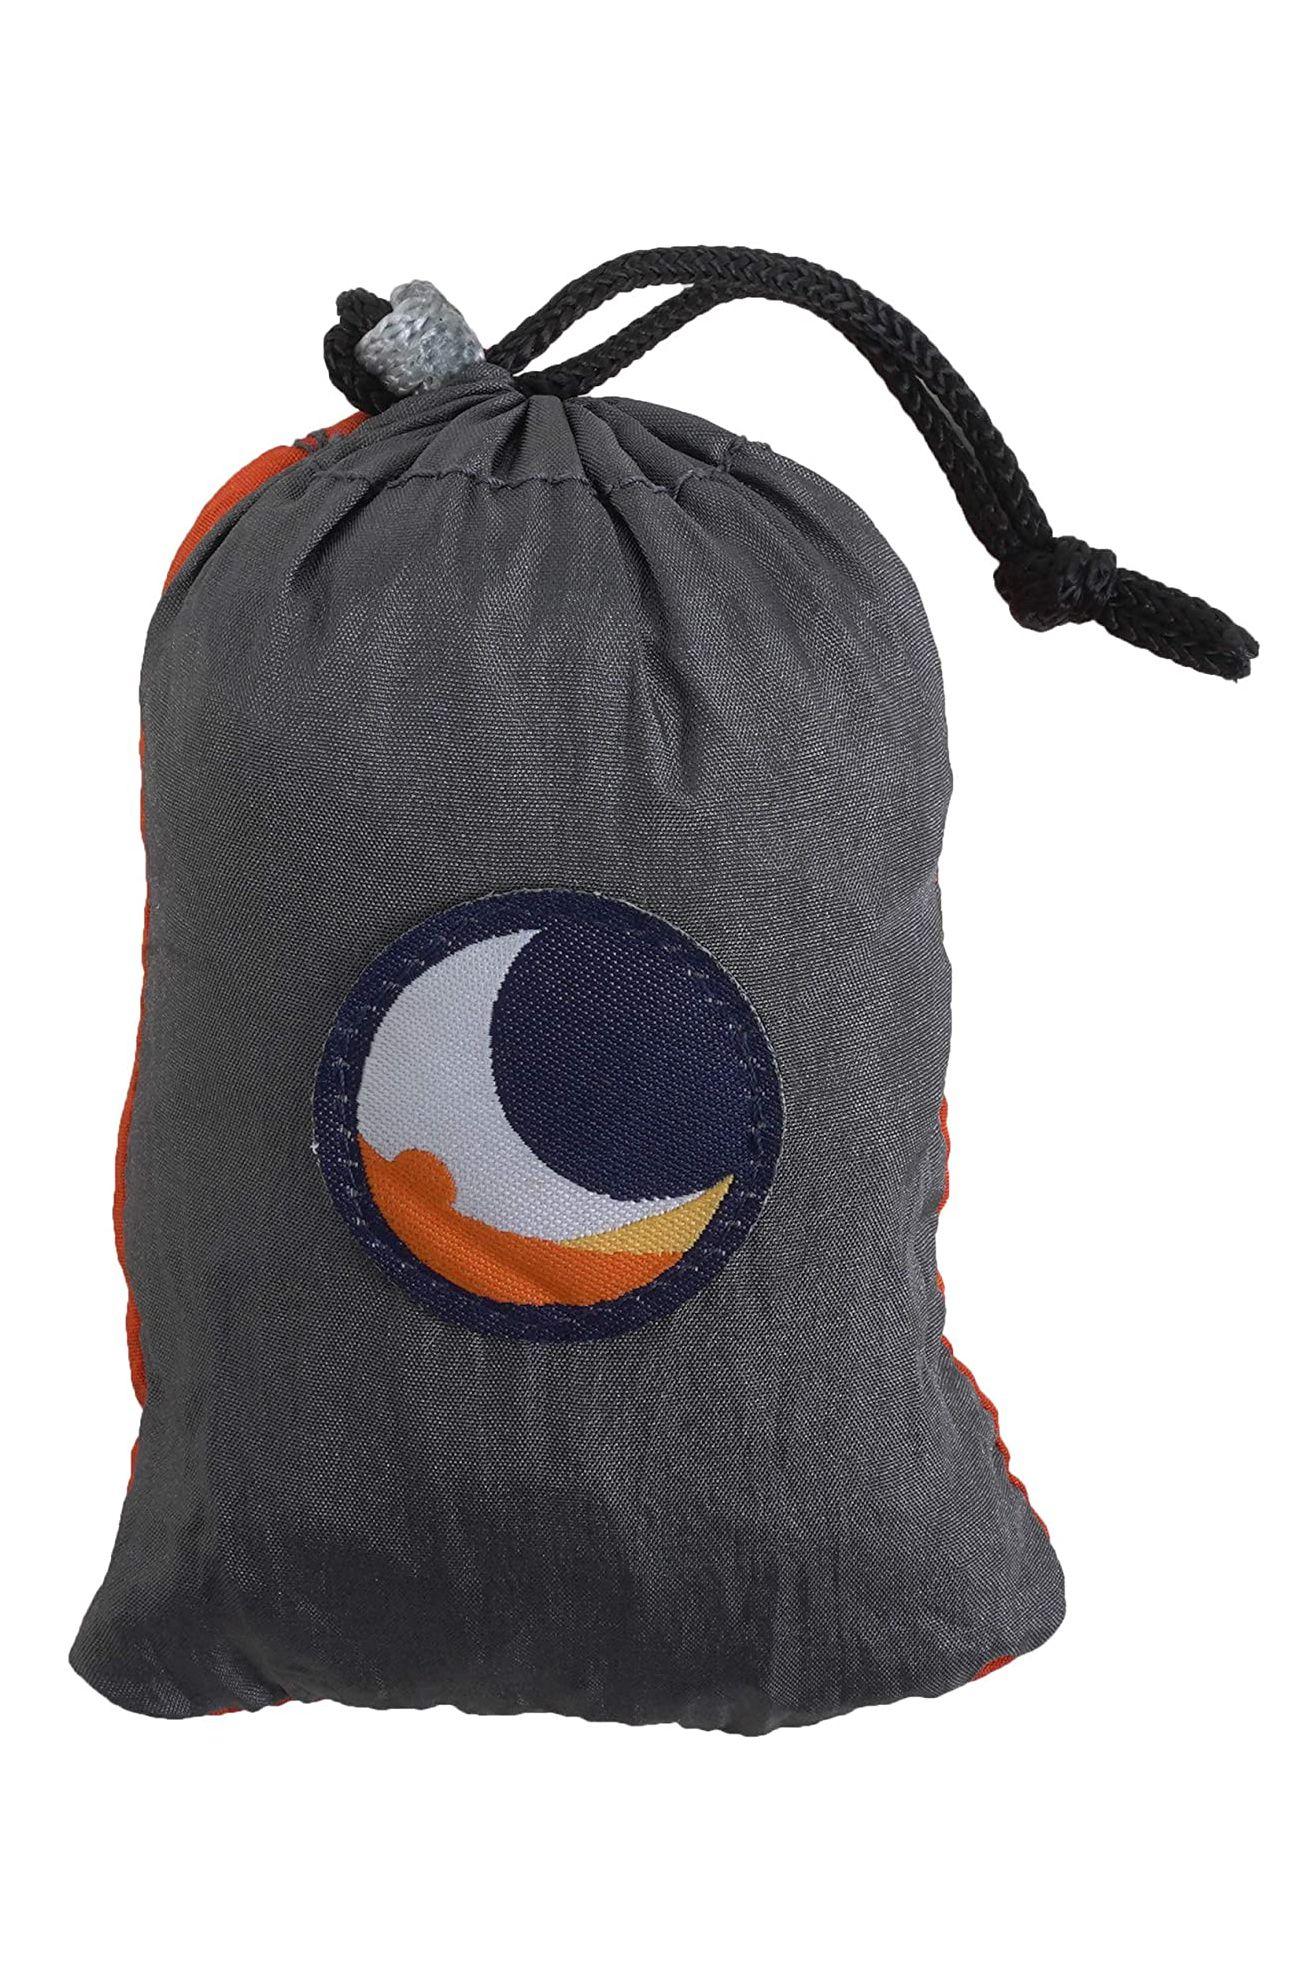 Ticket To The Moon Bag ECO BAG LARGE Dark Grey/Orange